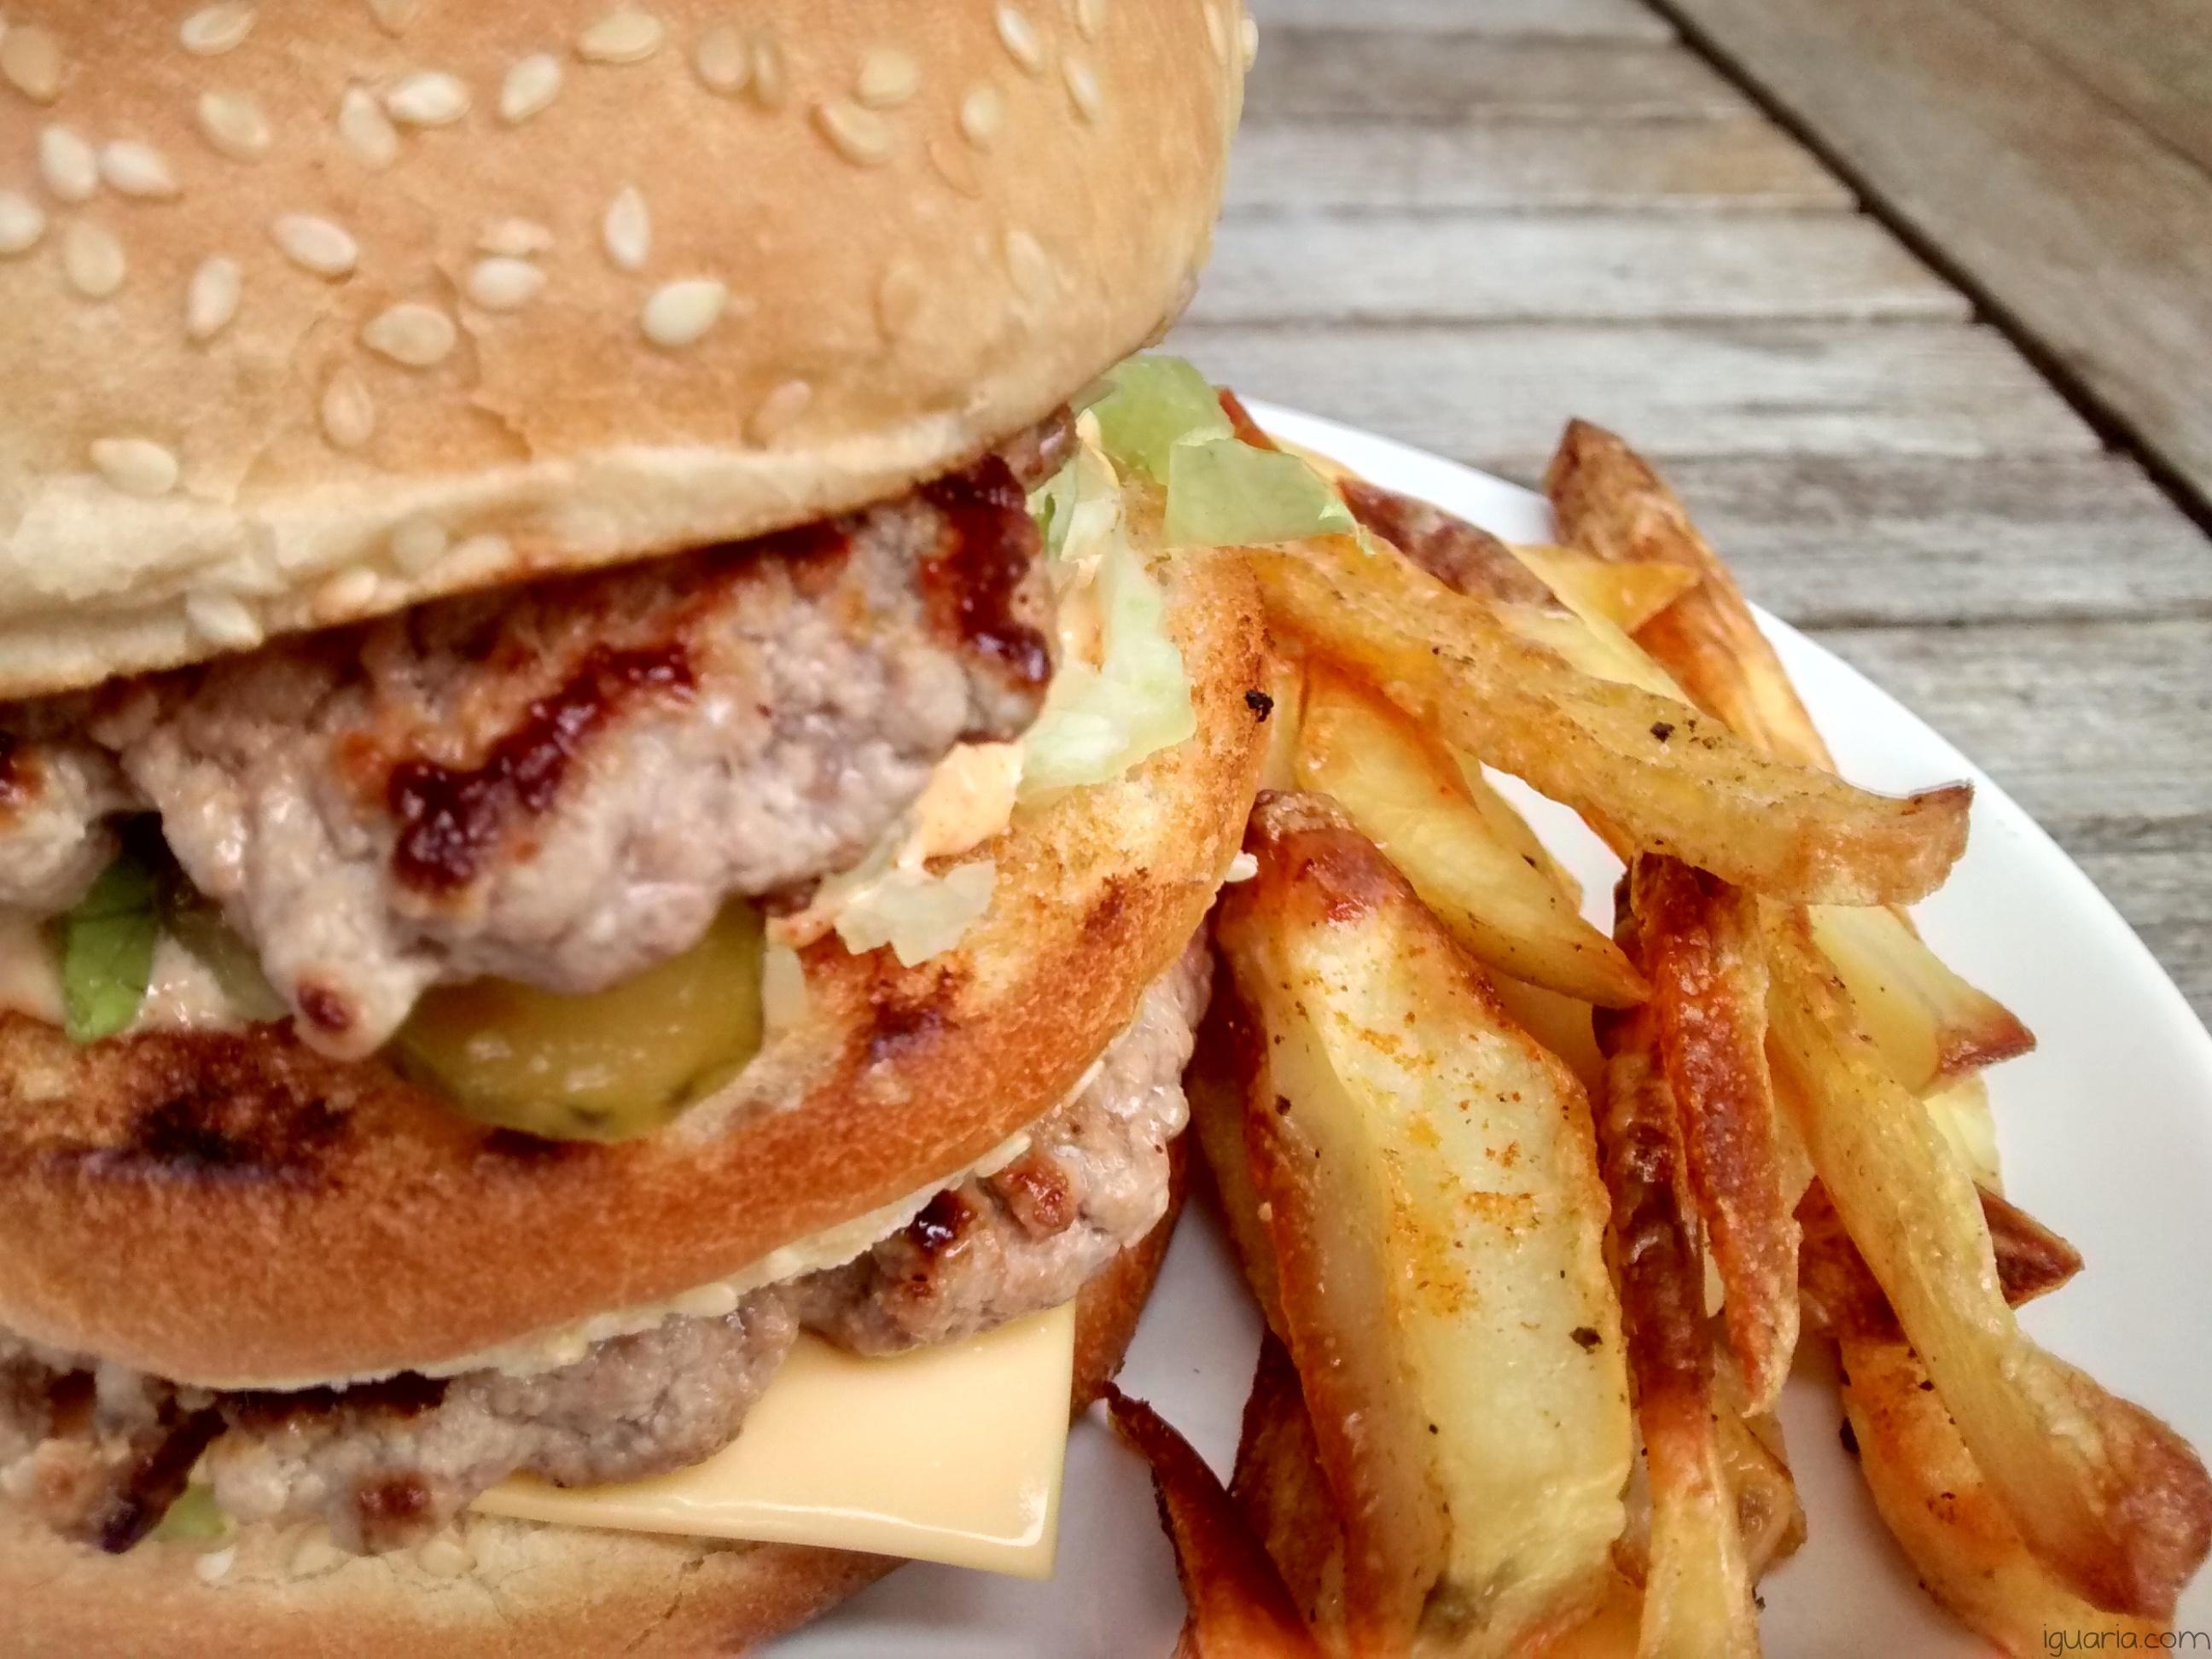 Iguaria_Macdonalds-Big-Mac-Caseiro